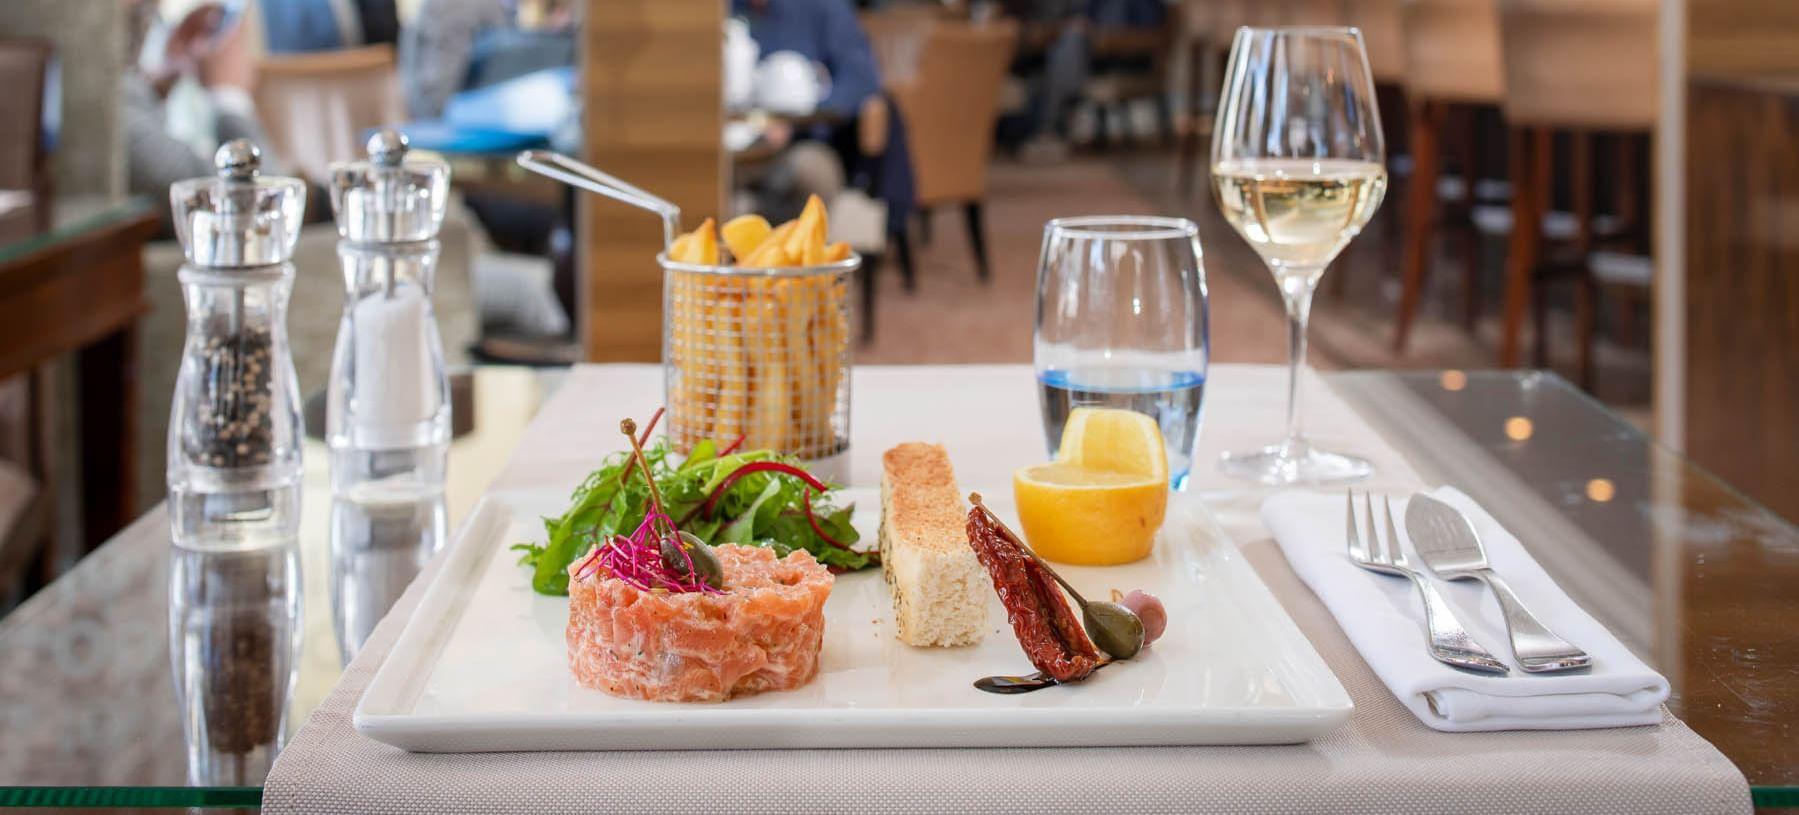 Table with salmon tartar and potato at Warwick Geneva